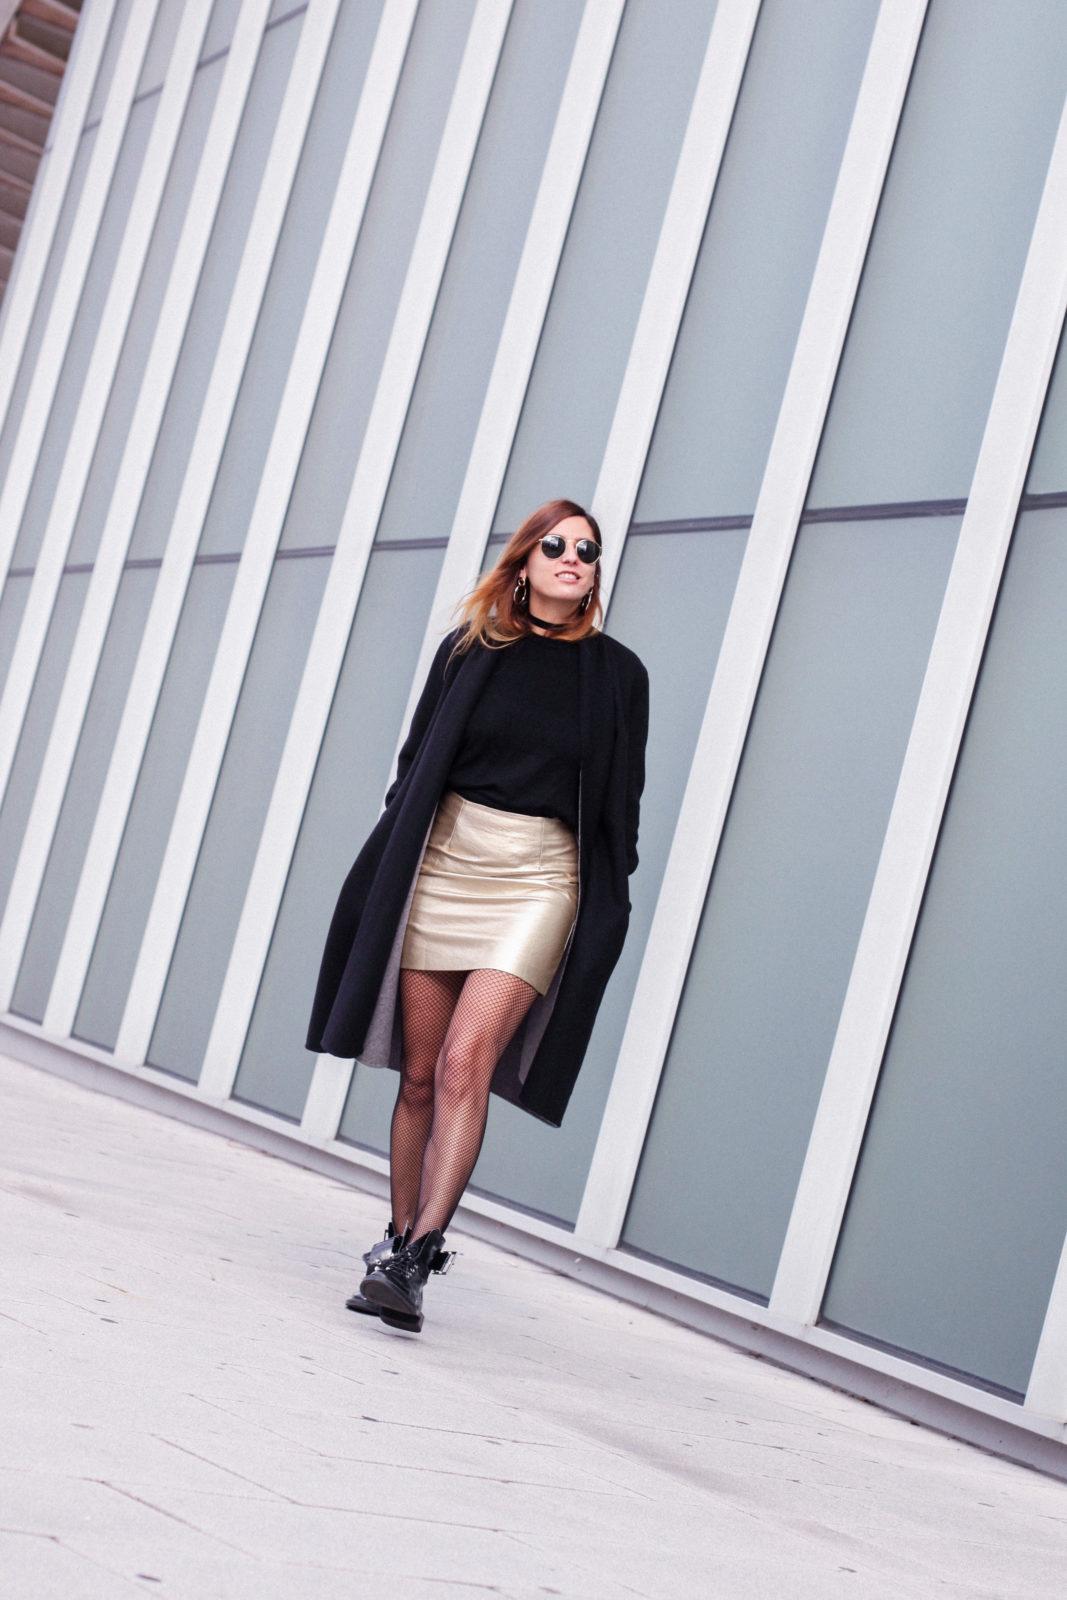 falda_dorada_shein_metalizado_medias_de_rejilla_choker_donkeycool_street_style_trends_2016-18